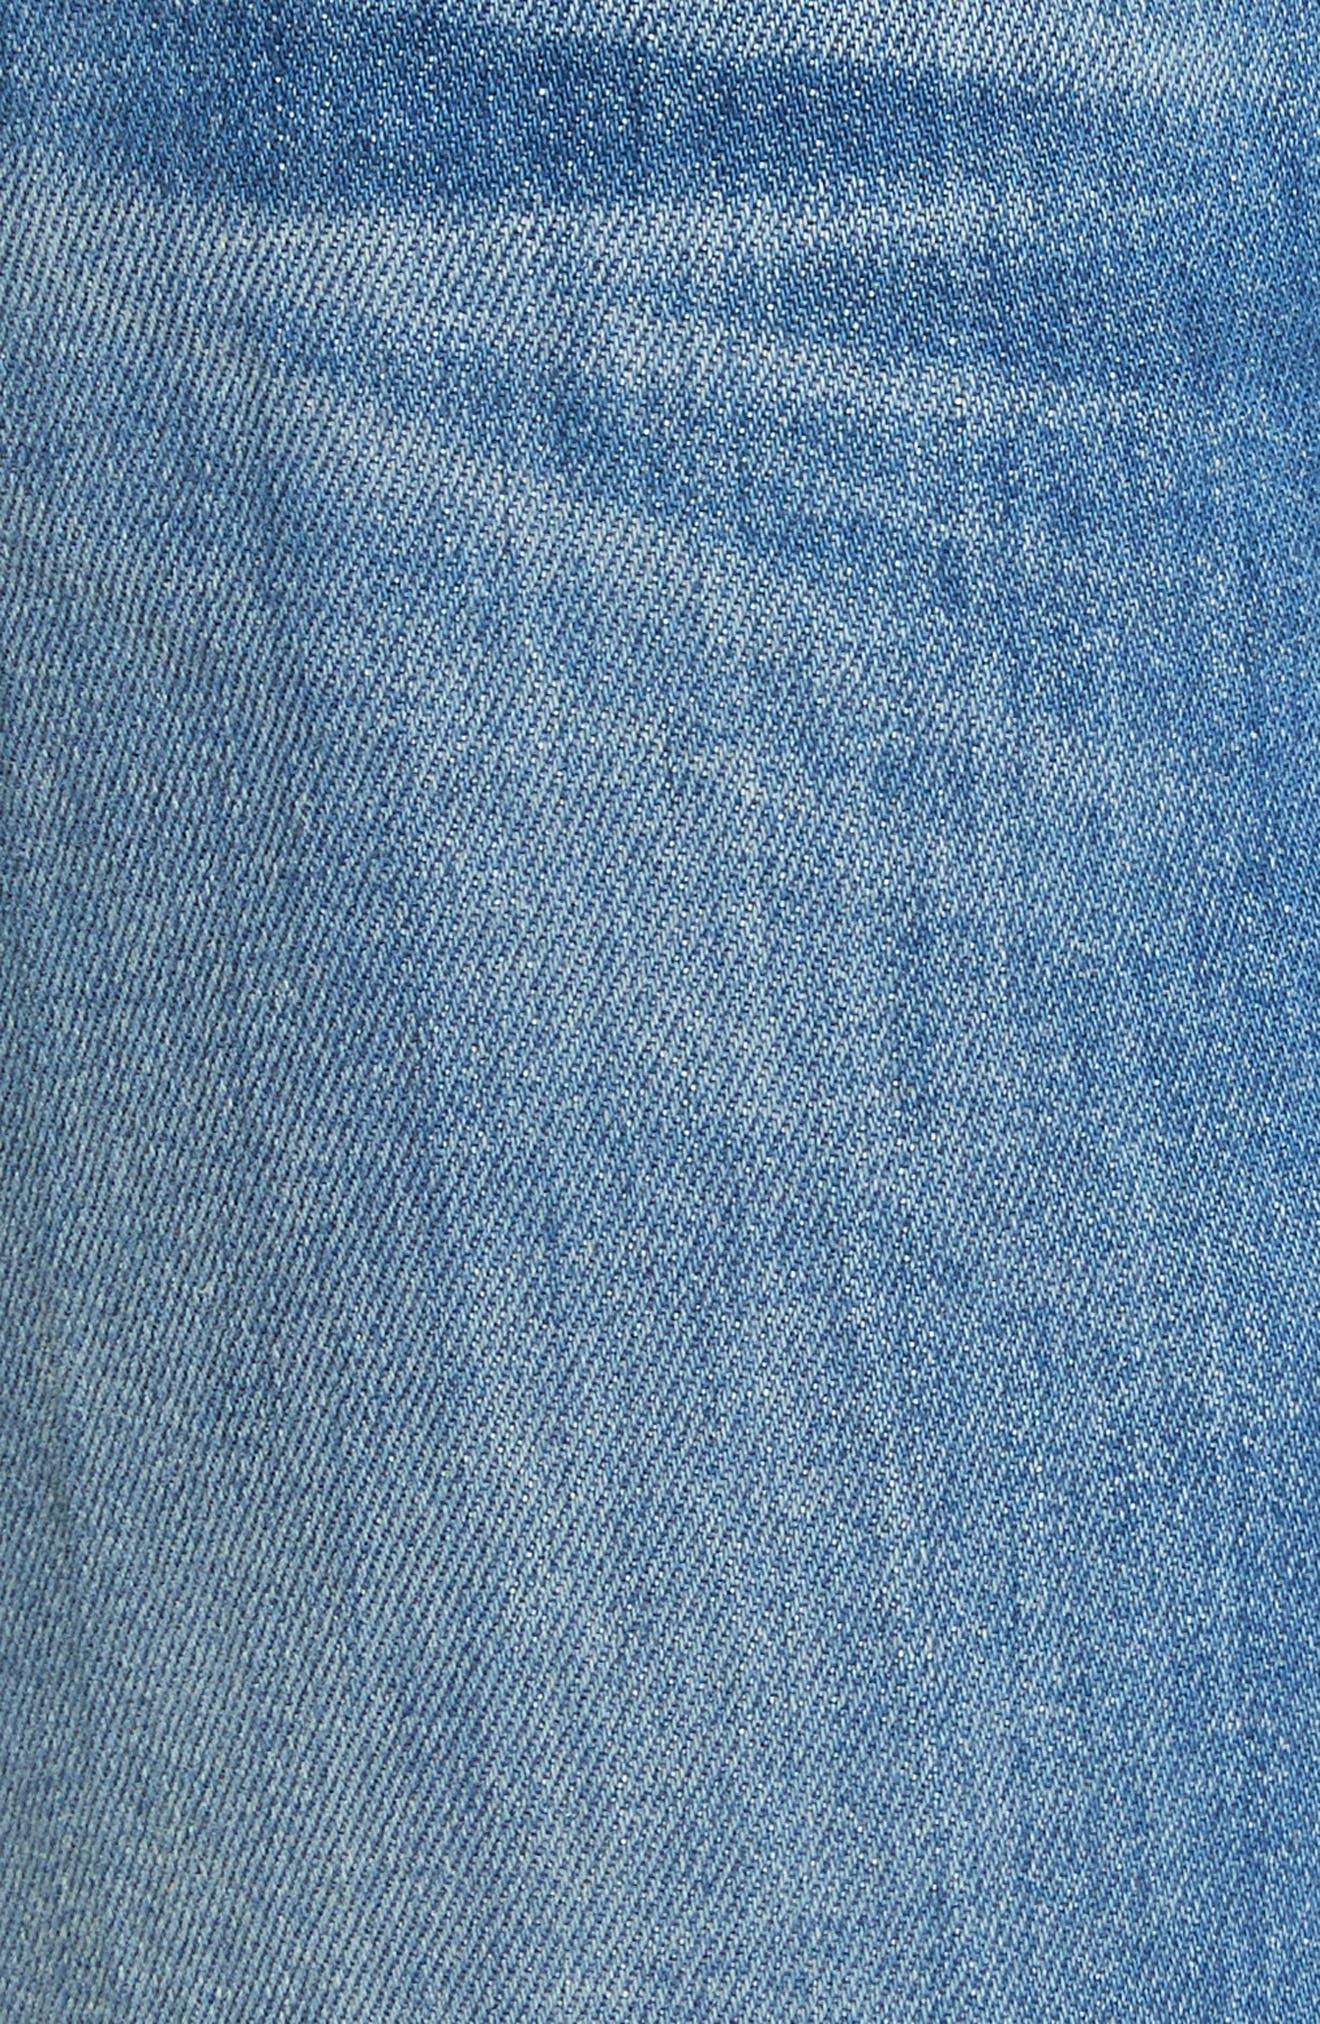 AO.LA Good High Waist Ankle Skinny Jeans,                             Alternate thumbnail 5, color,                             Side Hustle